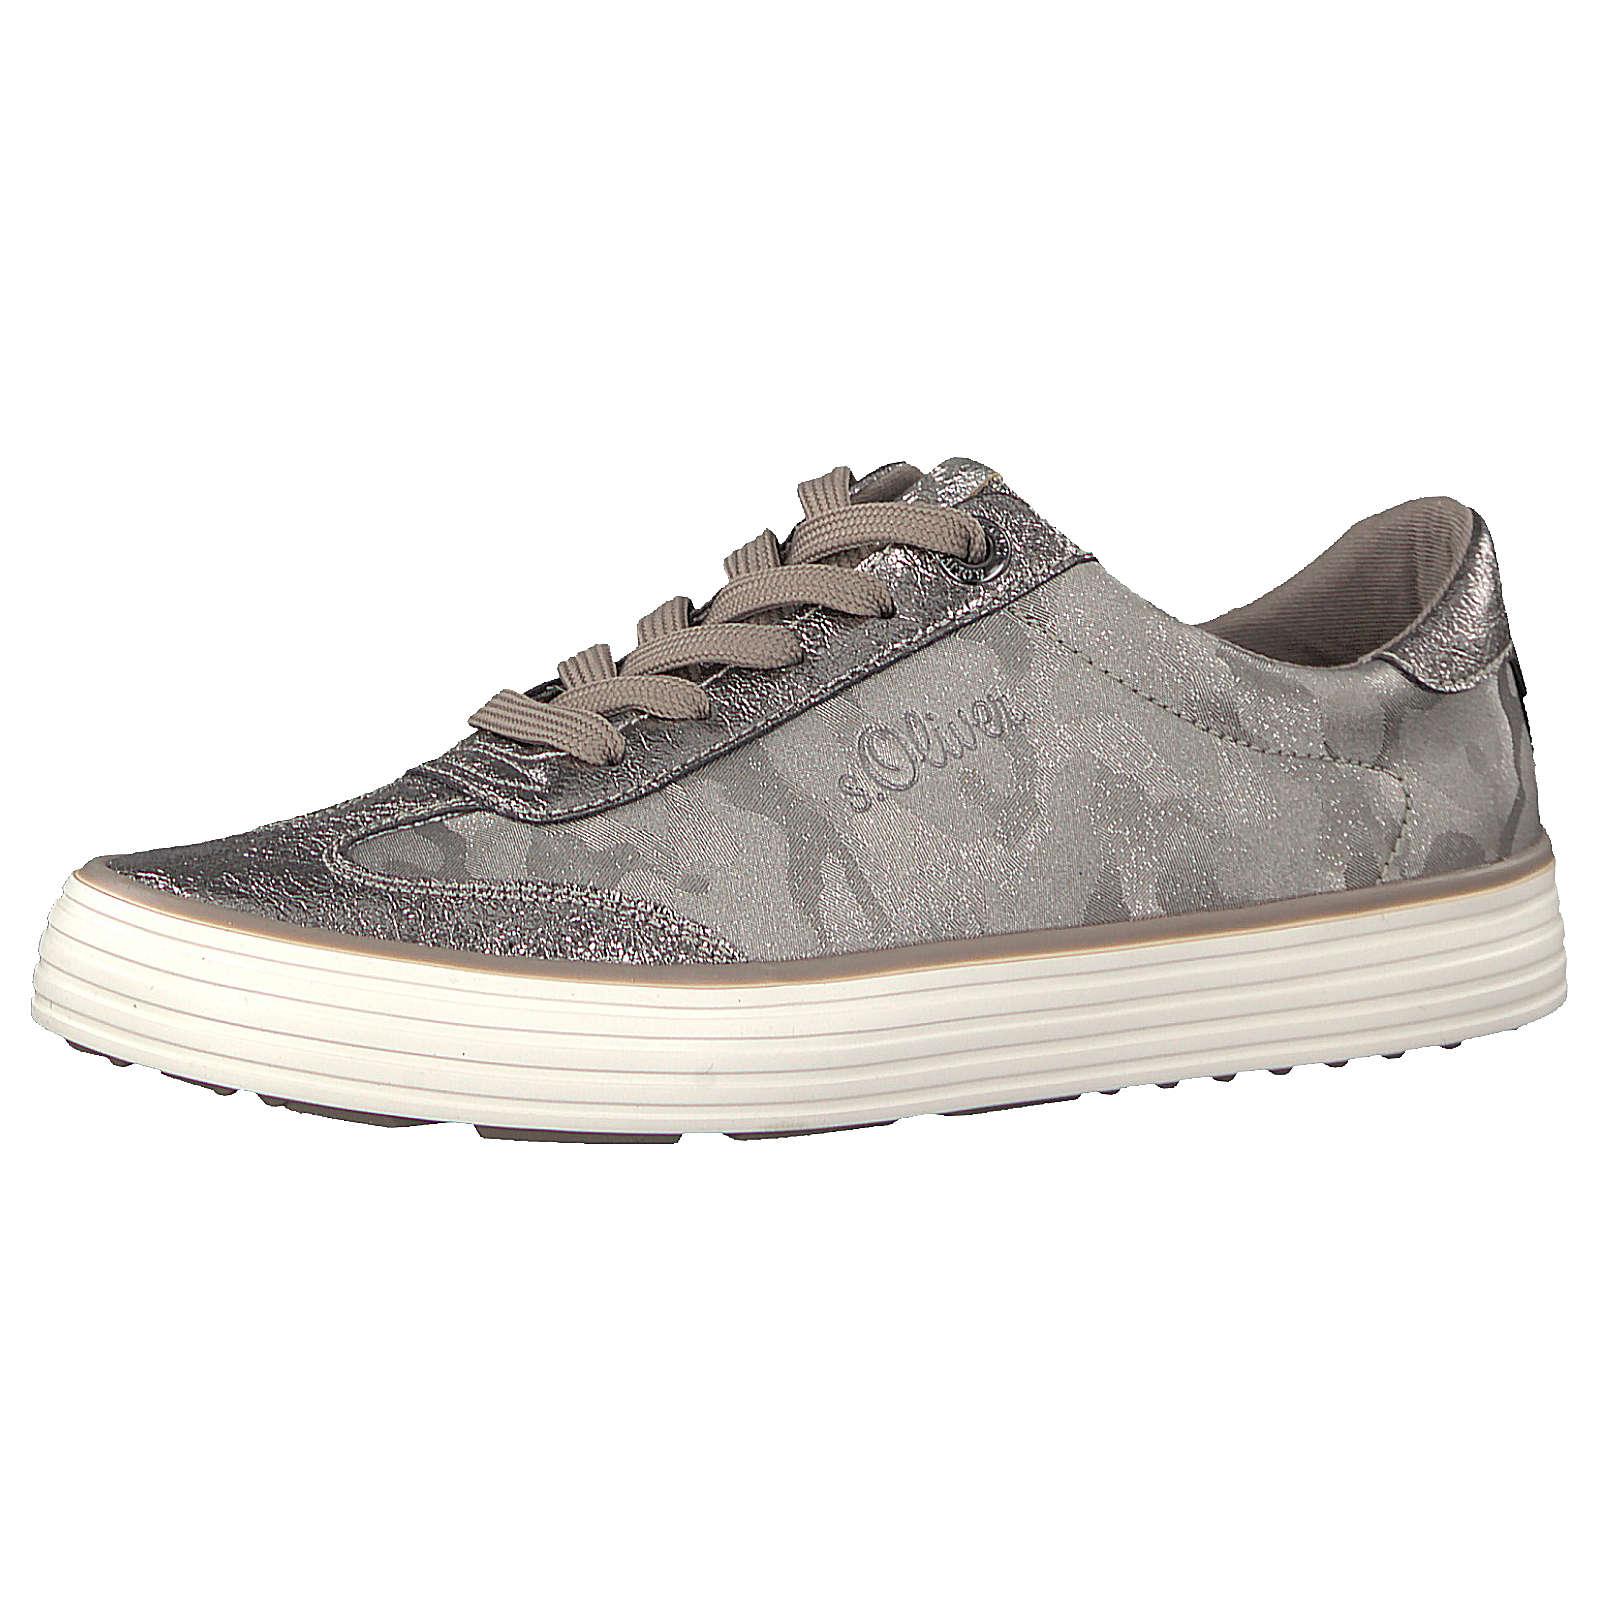 s.Oliver Sneakers Low grau-kombi Damen Gr. 36